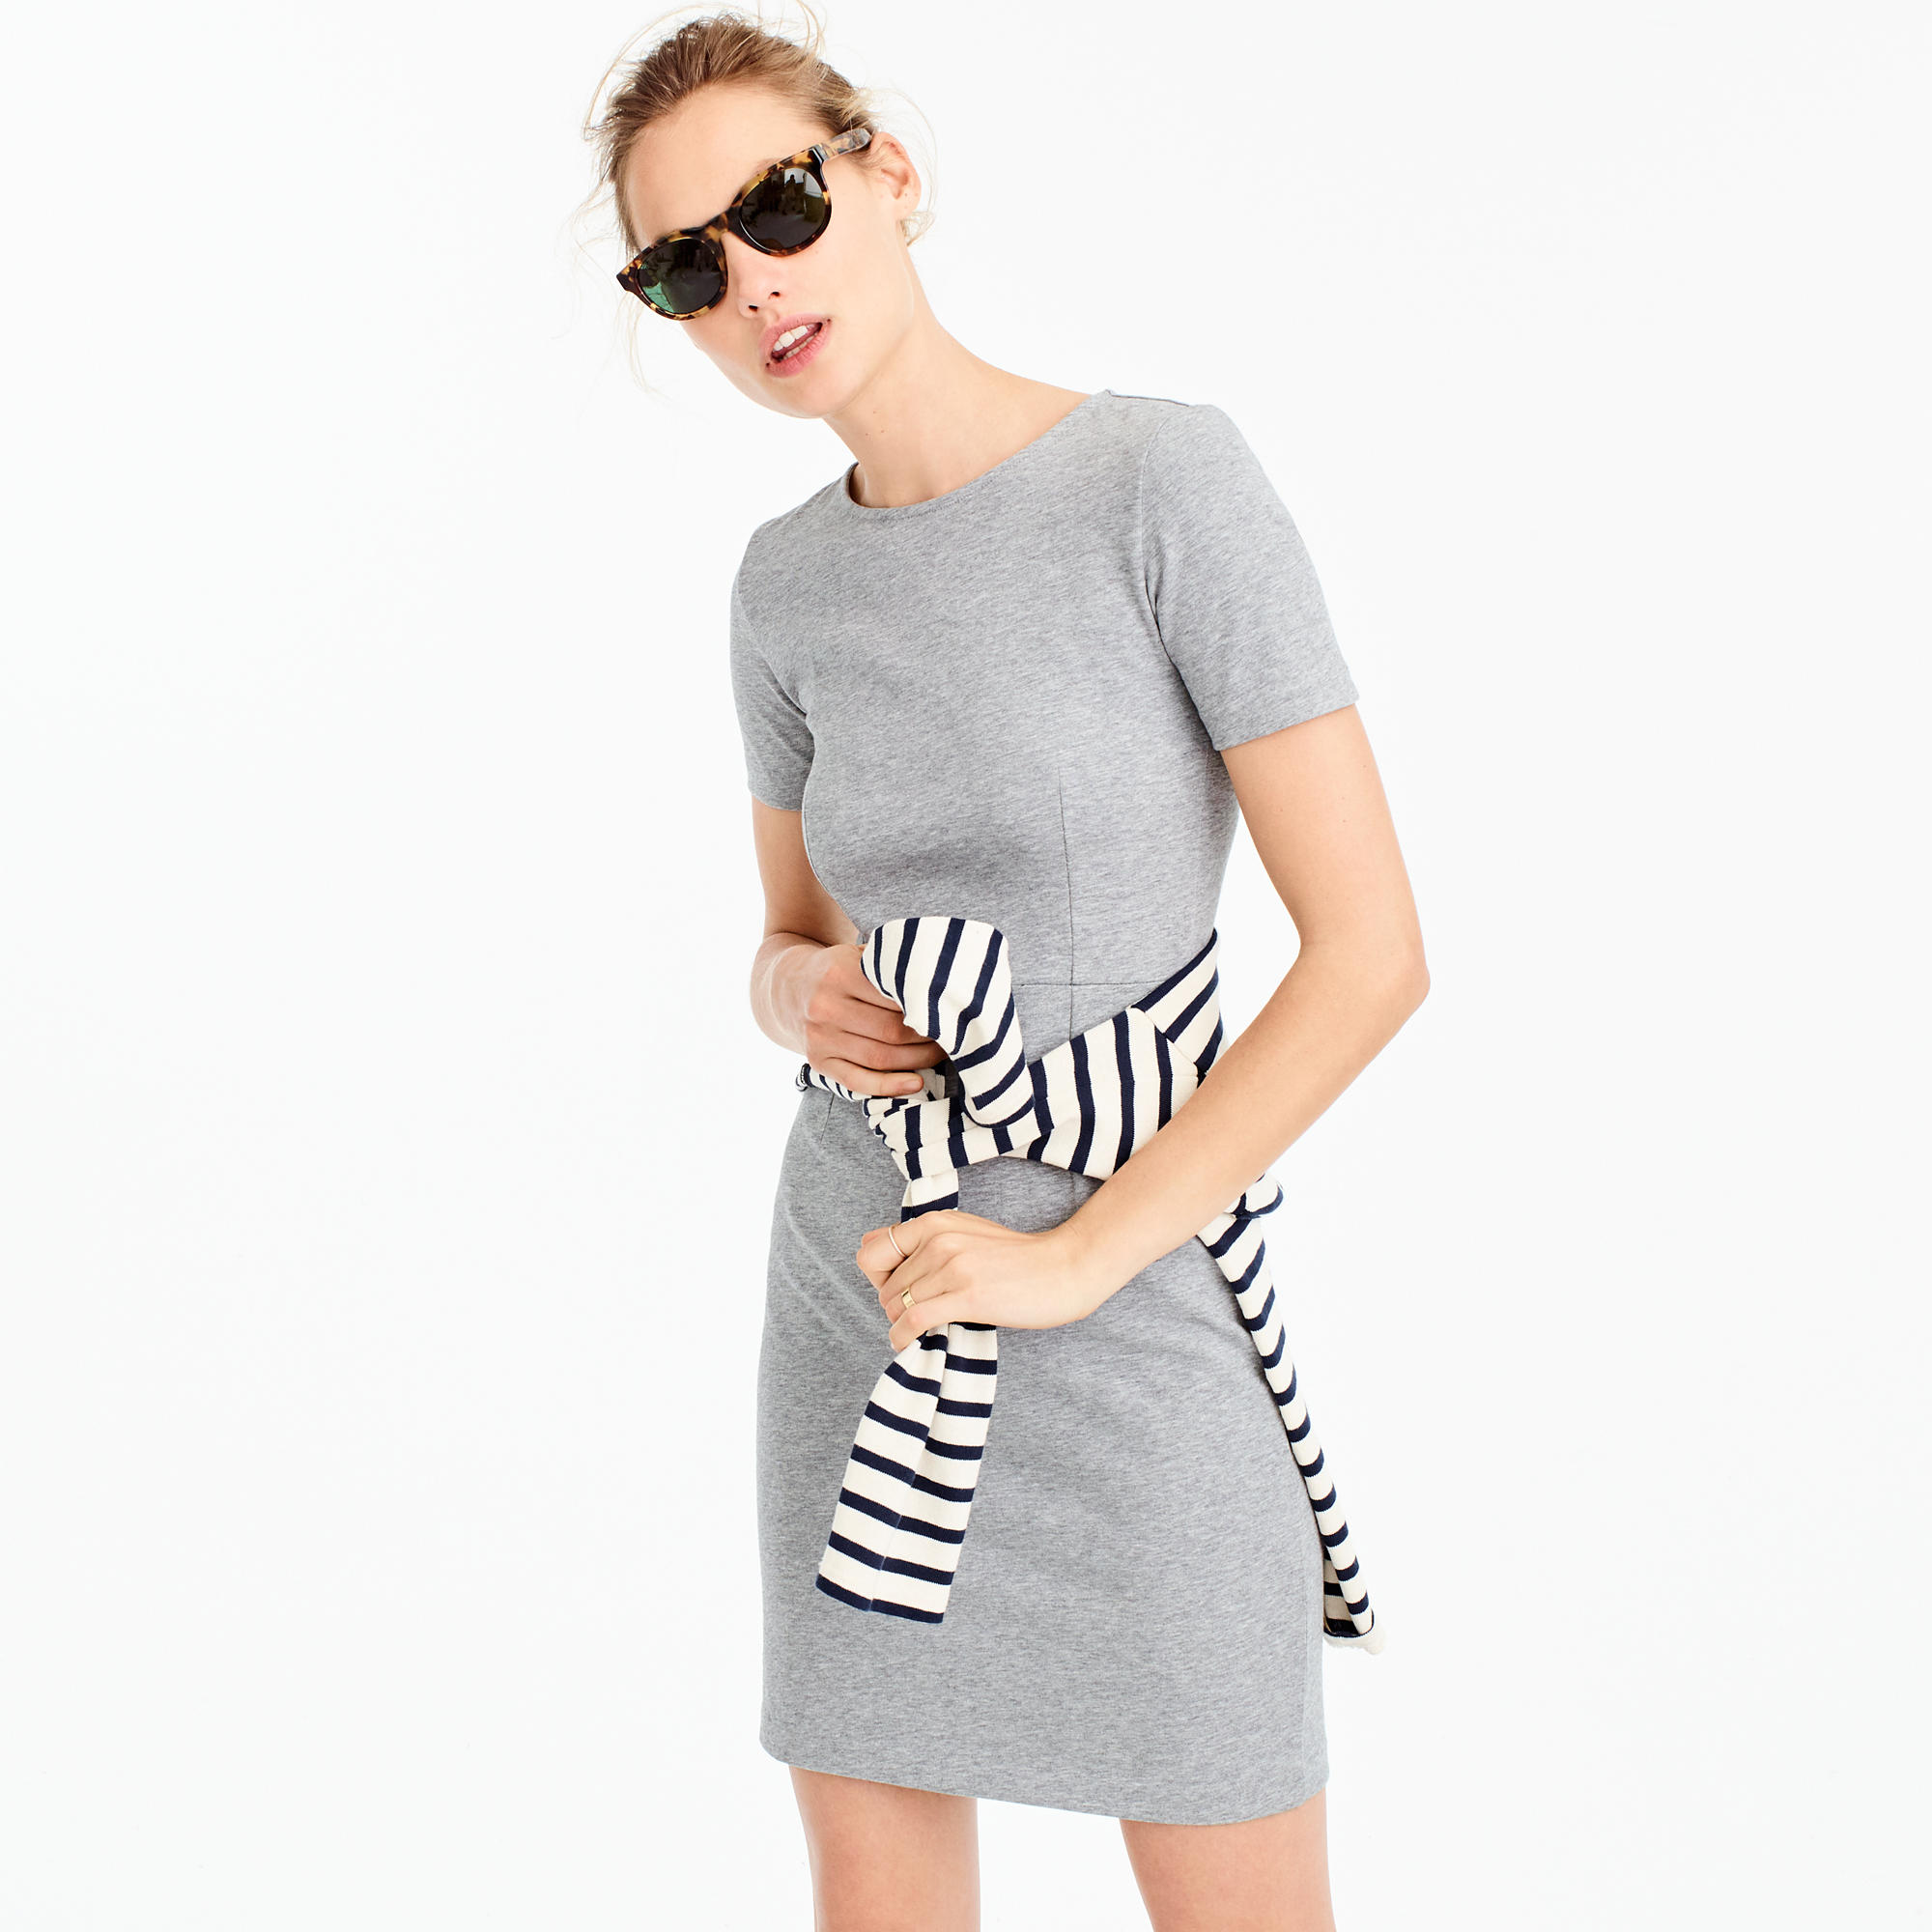 Navy short lace mini summer dress dresses elegant party vestidos brand - Short Sleeve Dress